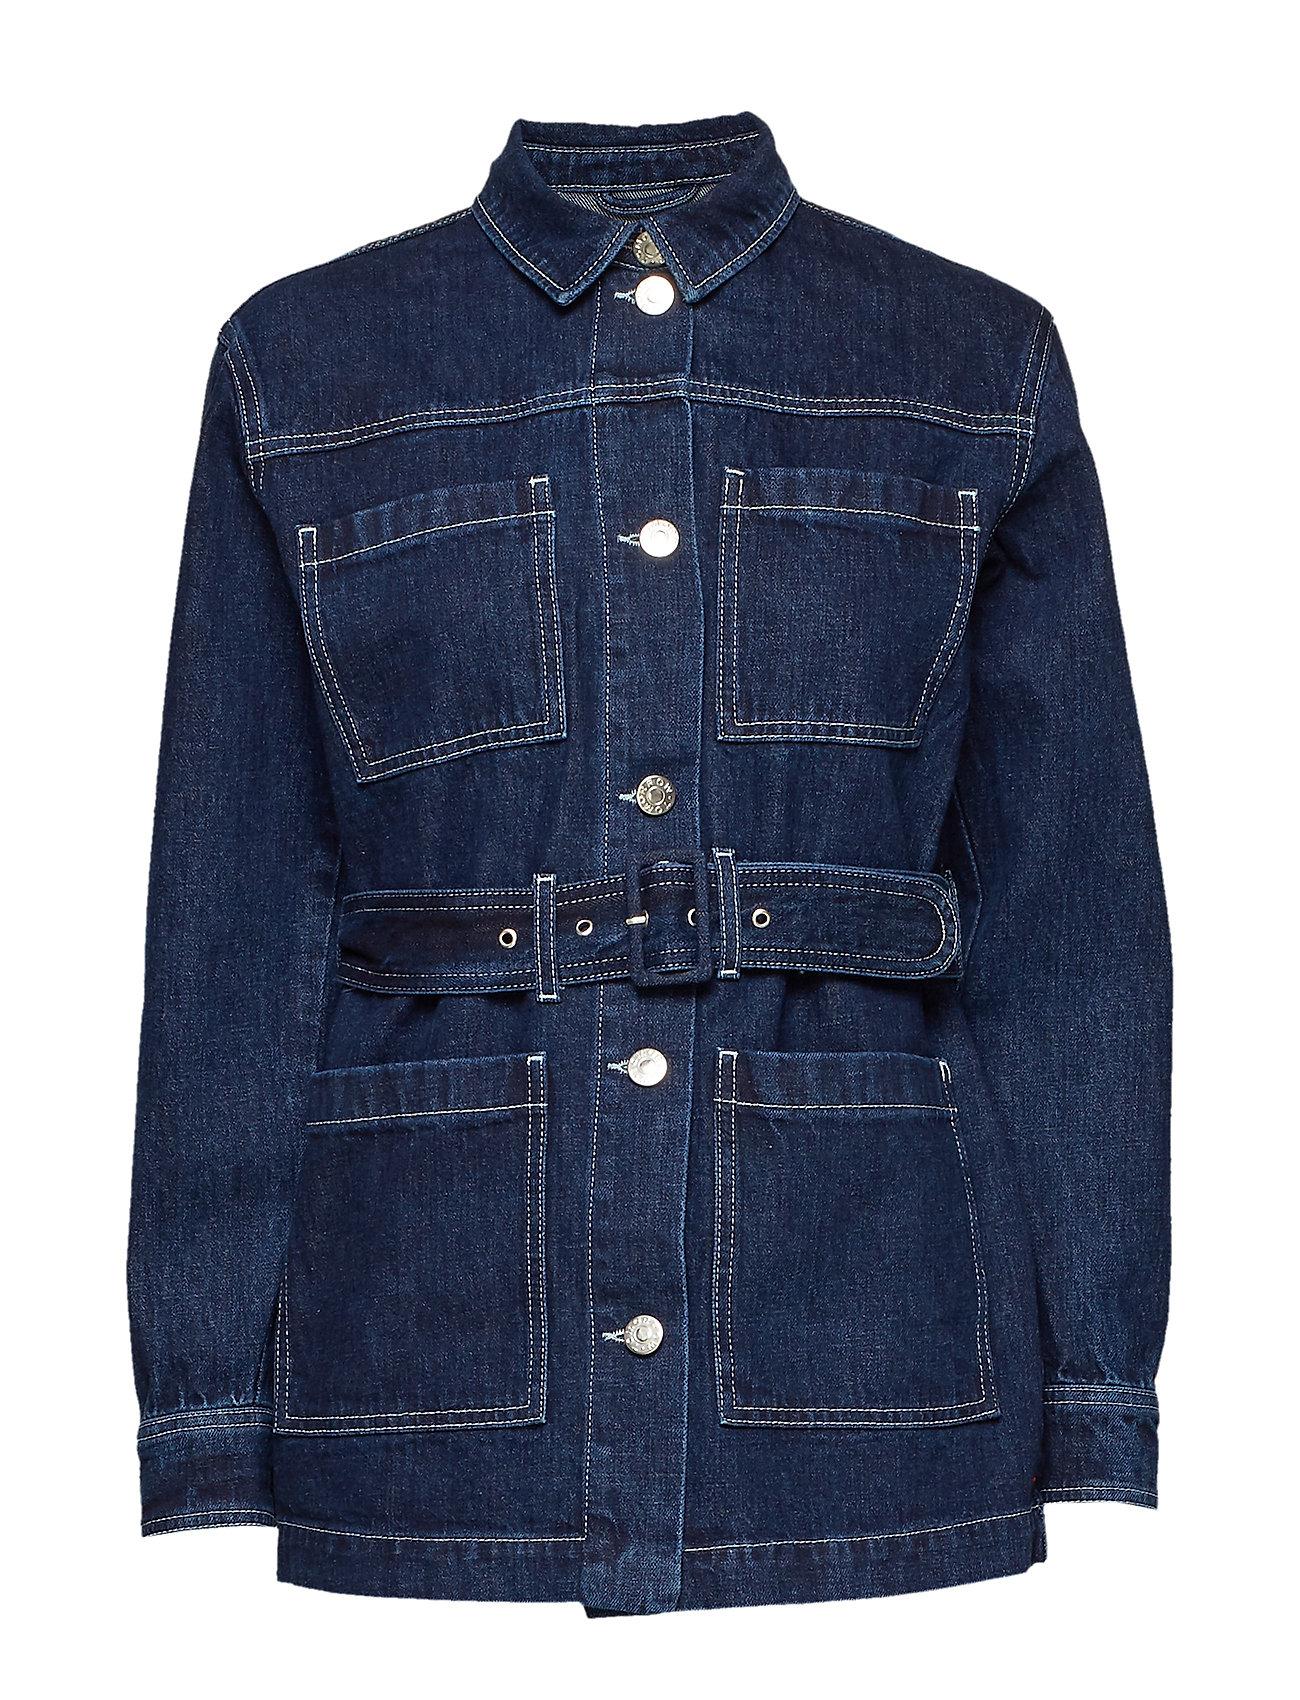 Tomorrow Mandela uniform jacket dark Oxford - DENIM BLUE